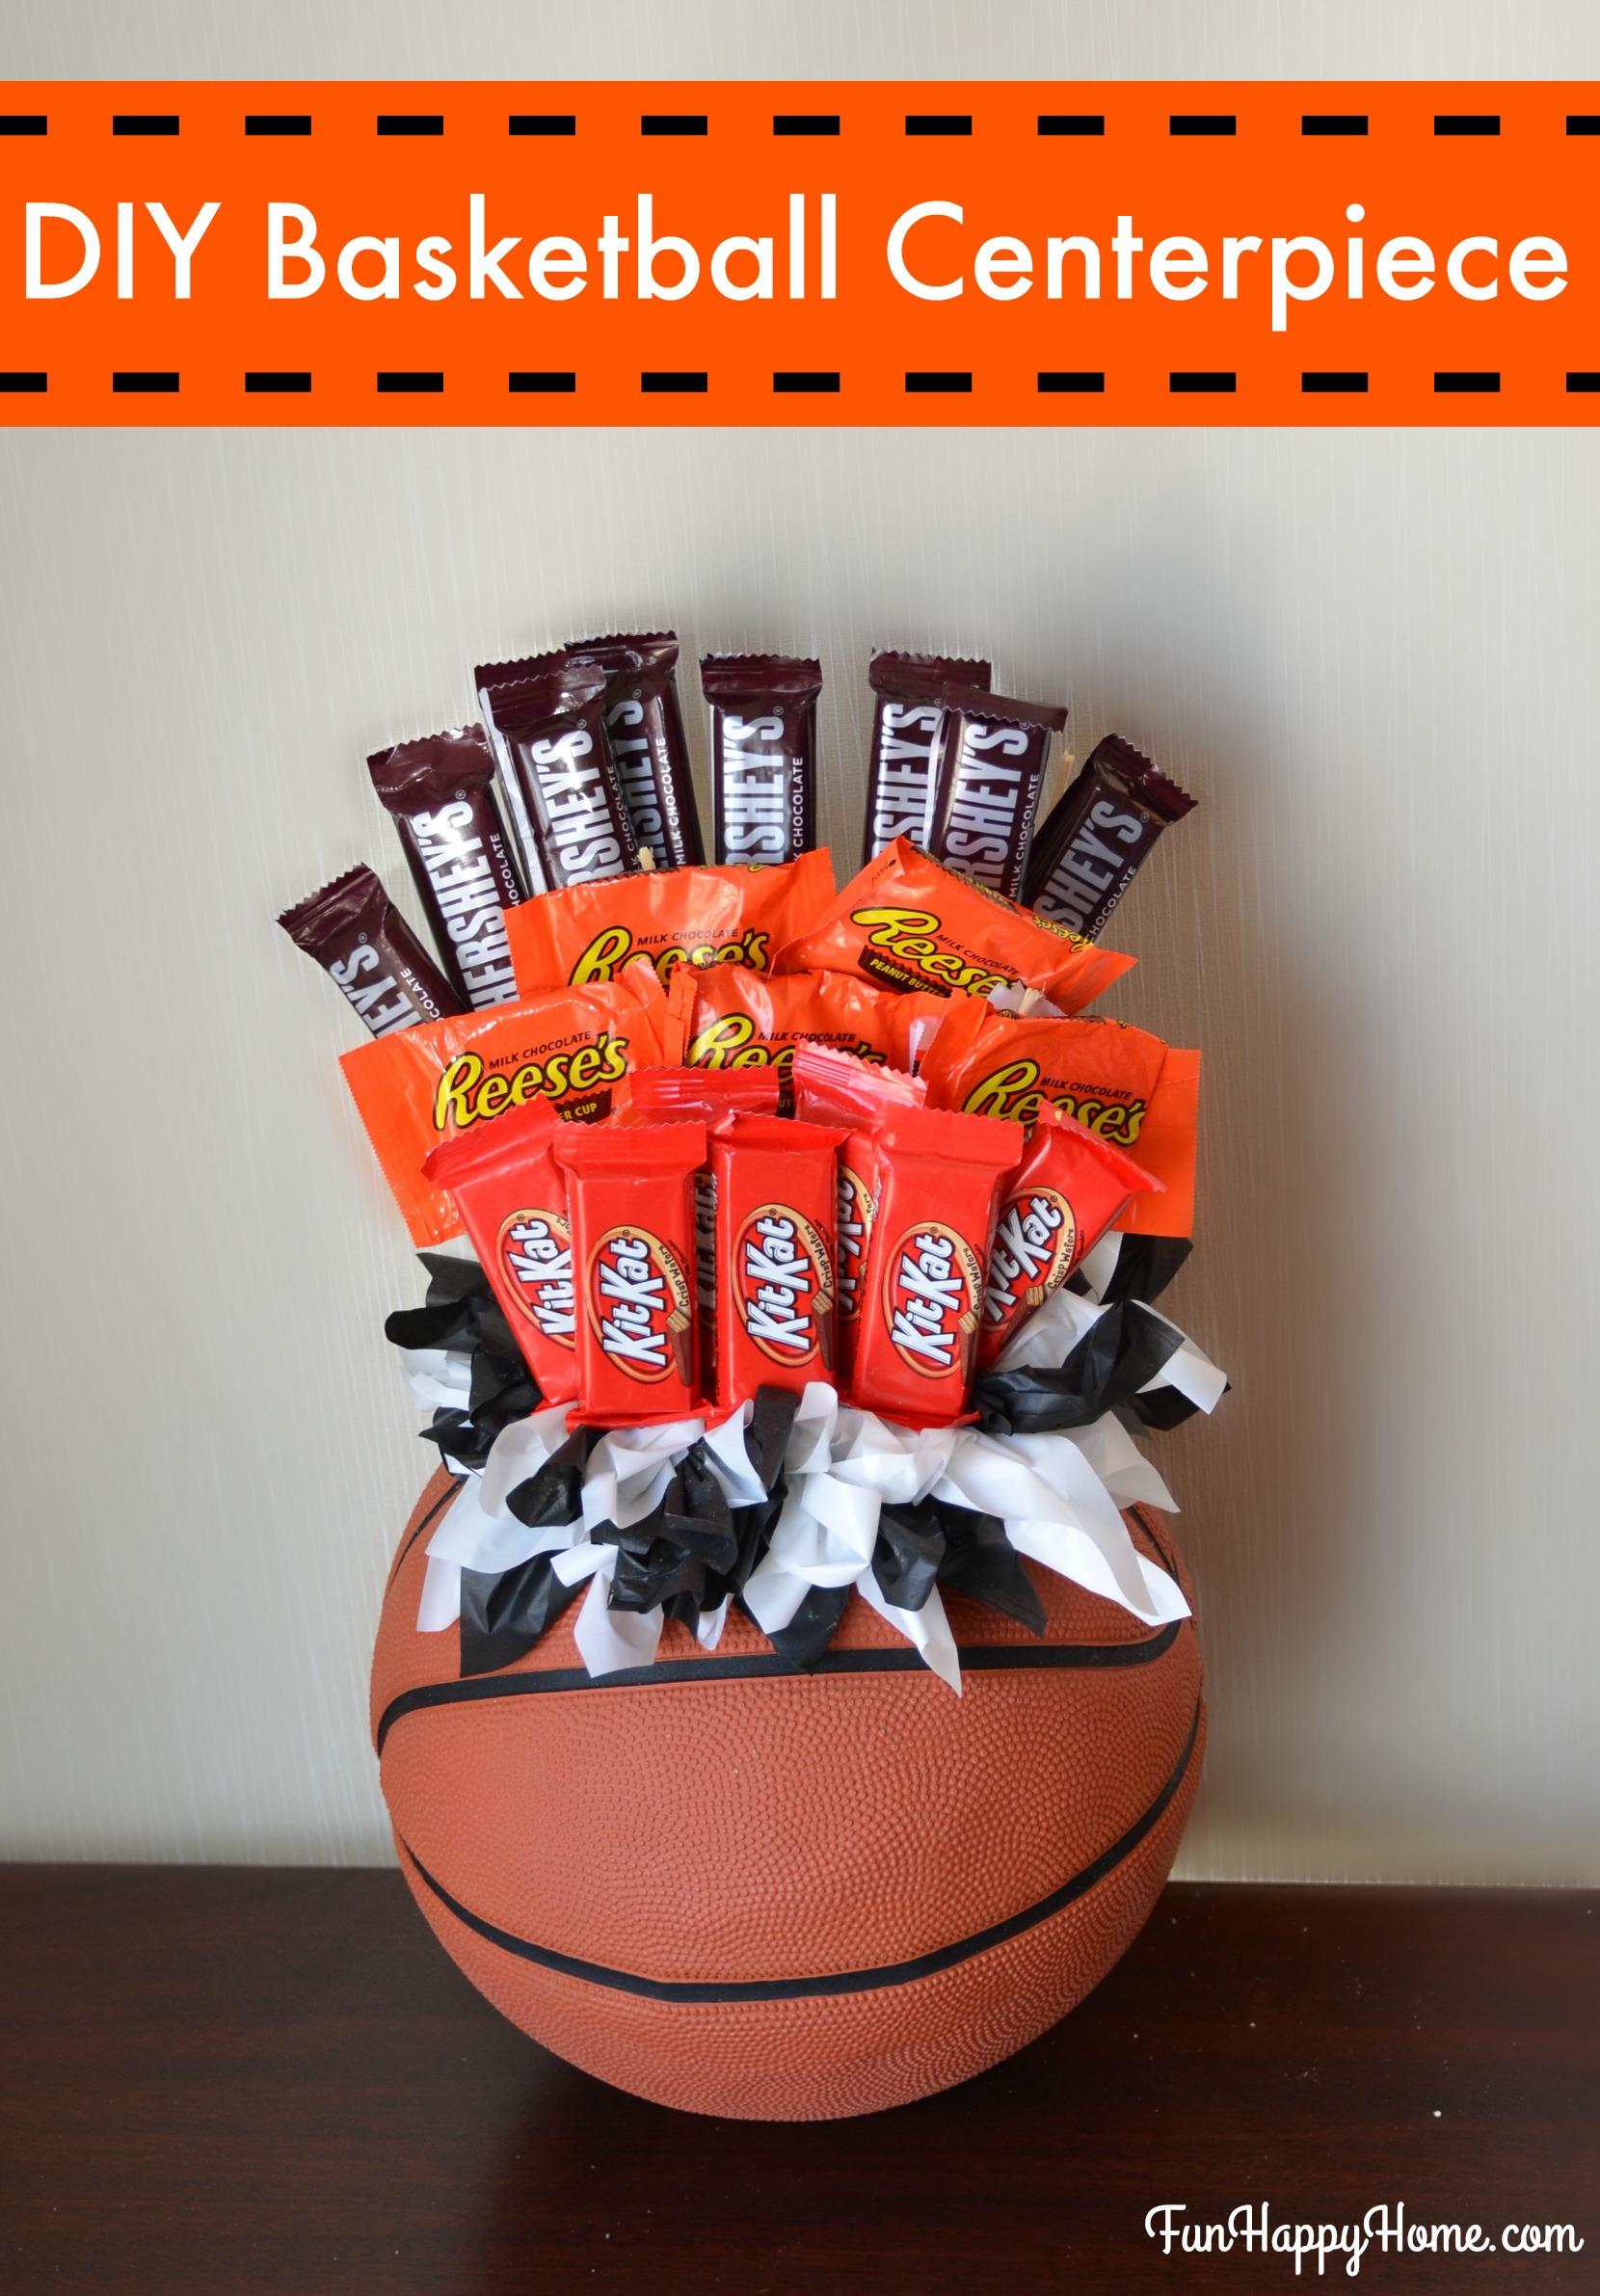 DIY Basketball Centerpiece: A Fun Candy Bouquet